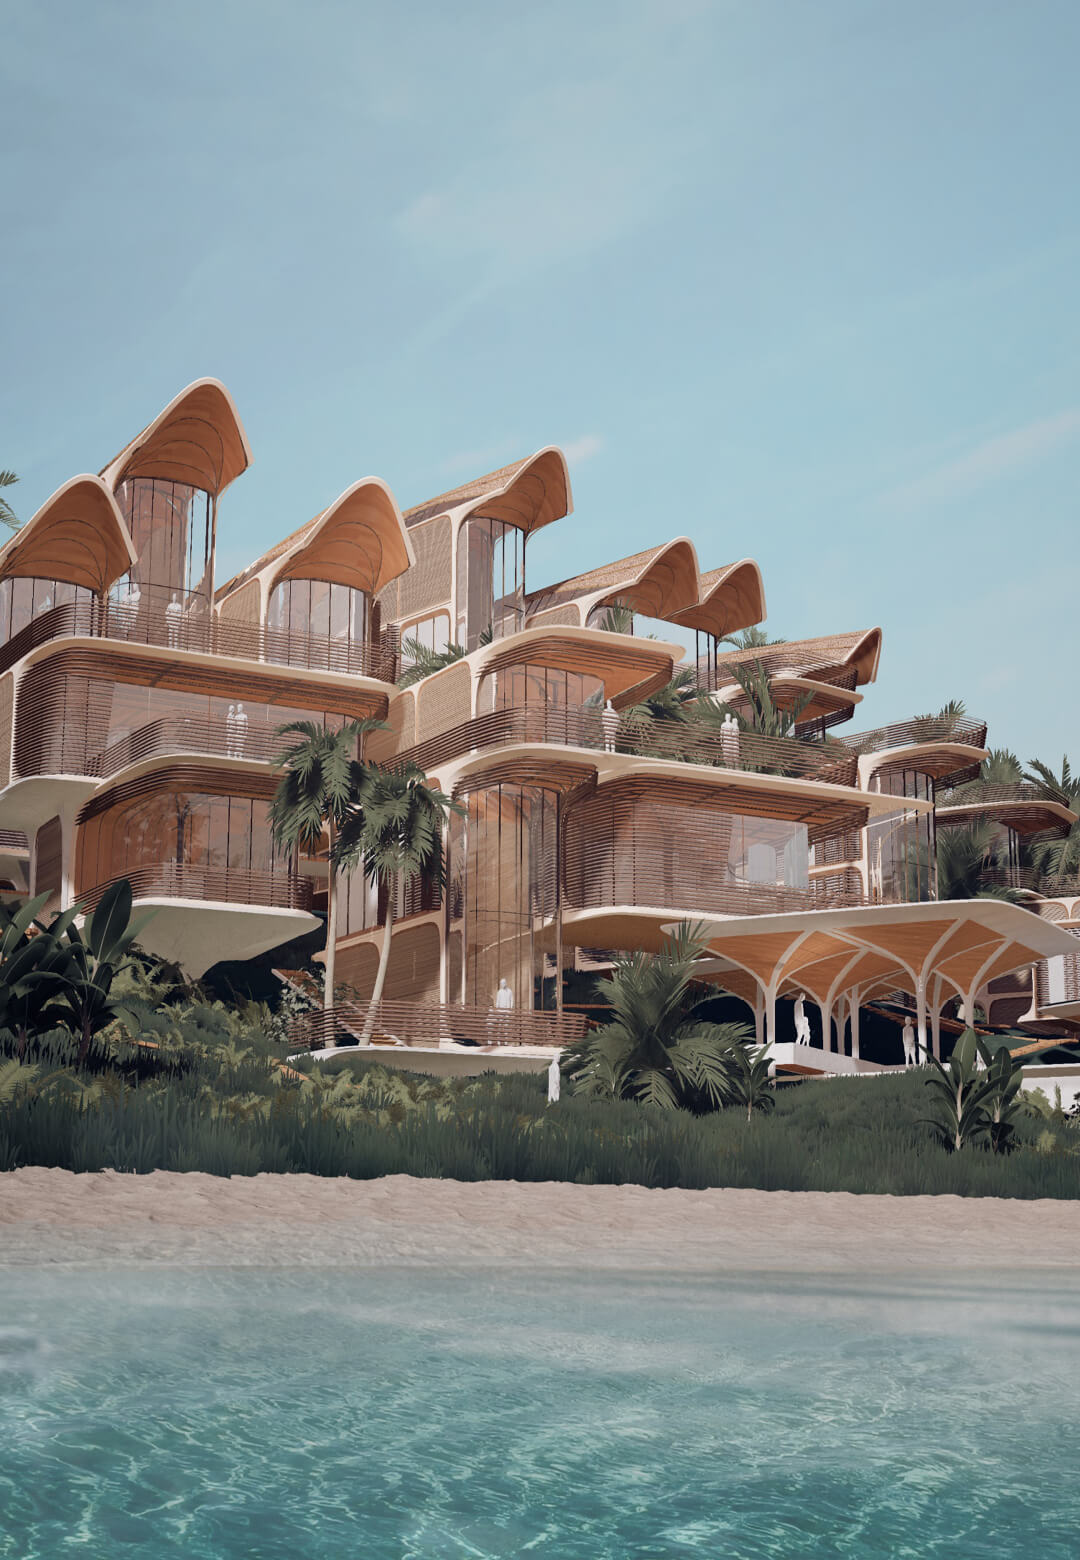 Proposed design for 'Roatán Próspera Residences' in Honduras by Zaha Hadid Architects | Roatán Próspera Residences by Zaha Hadid Architects | STIRworld